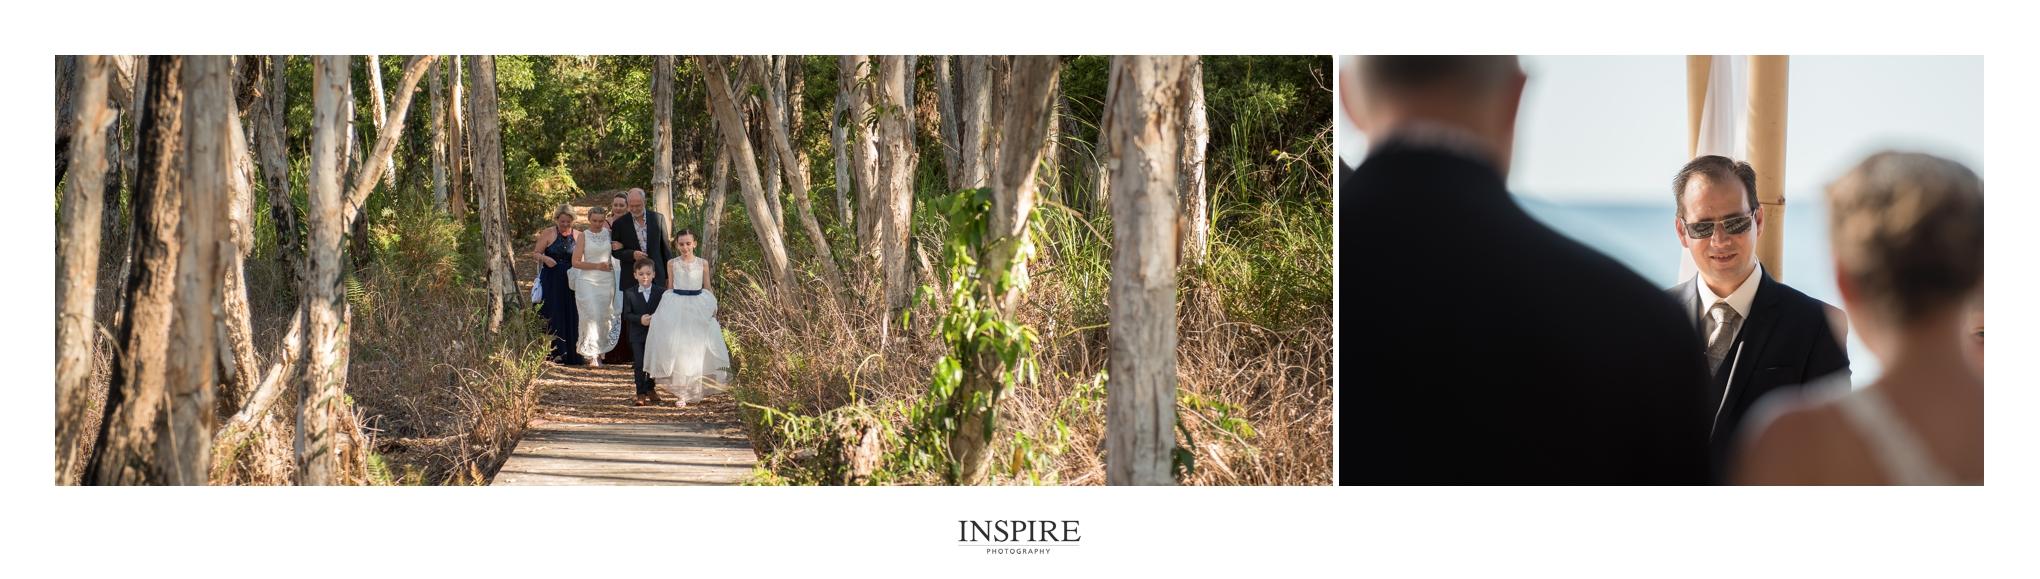 ryan and Trudi Blog 9.jpg